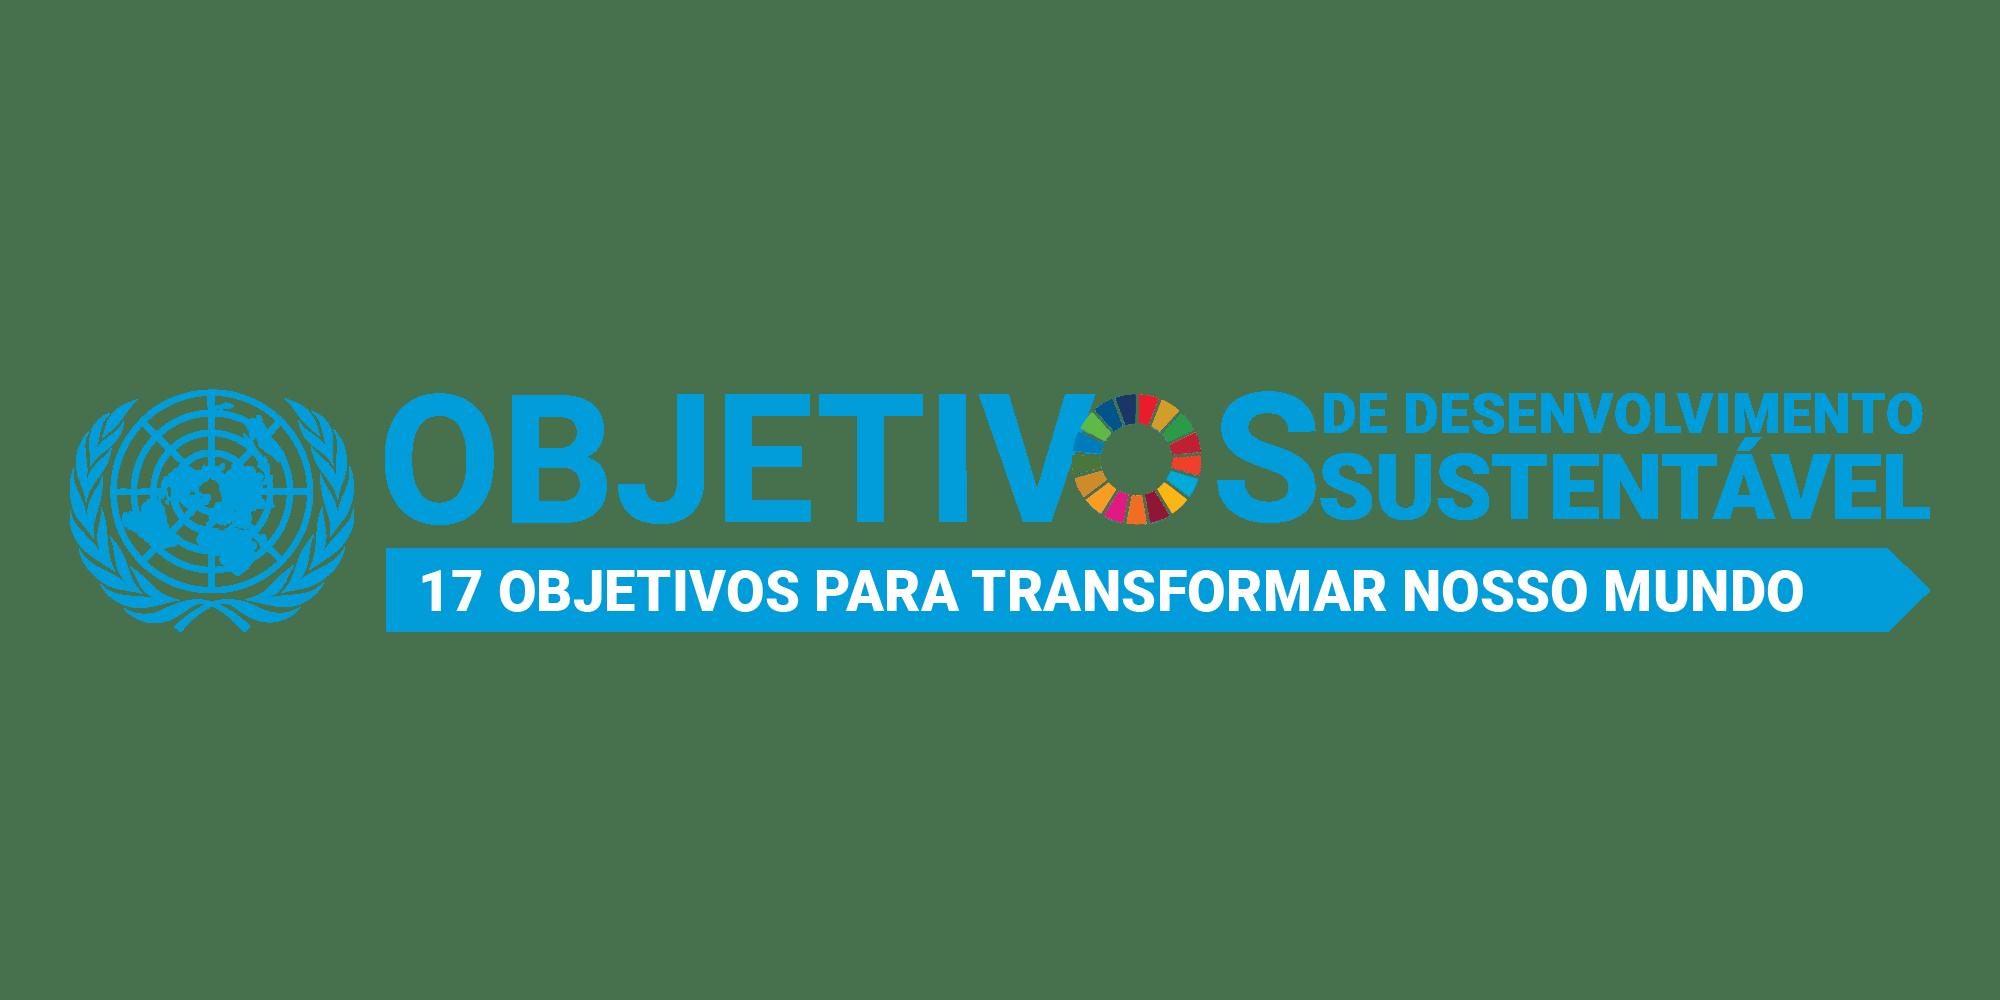 Logo_ODS-ONU_+_Tagline